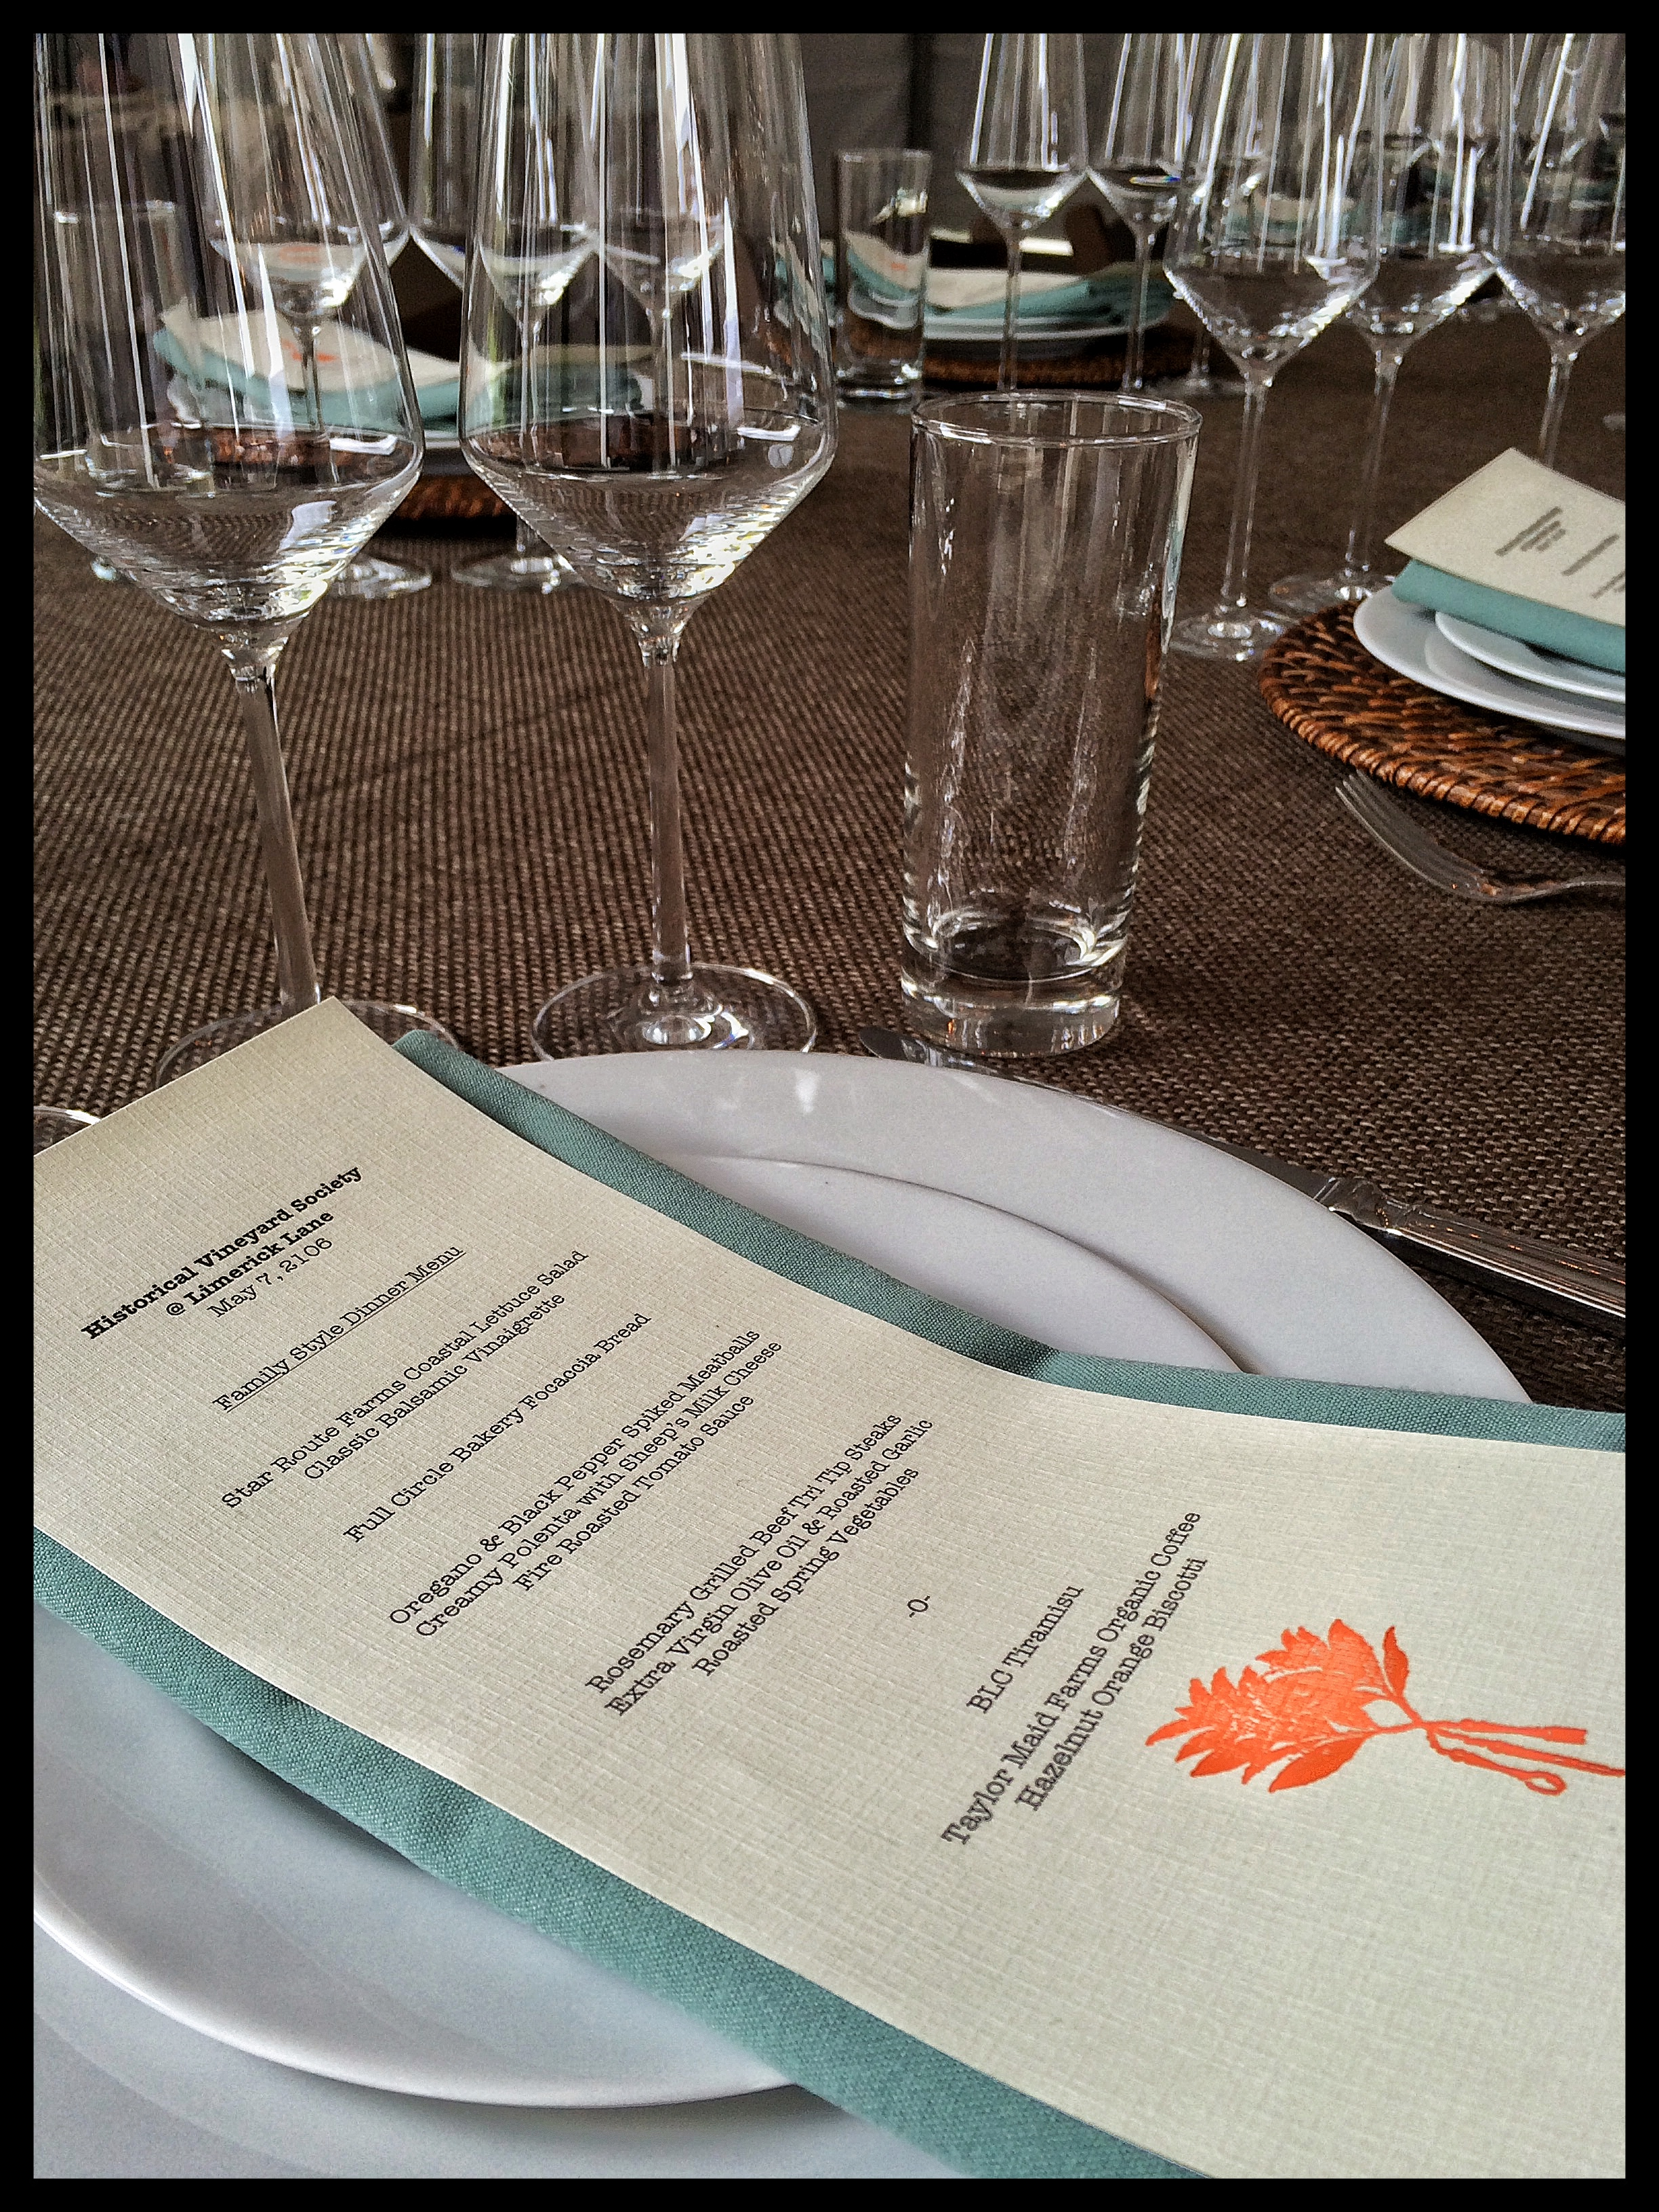 Menus, Plates and Glasses await Guests